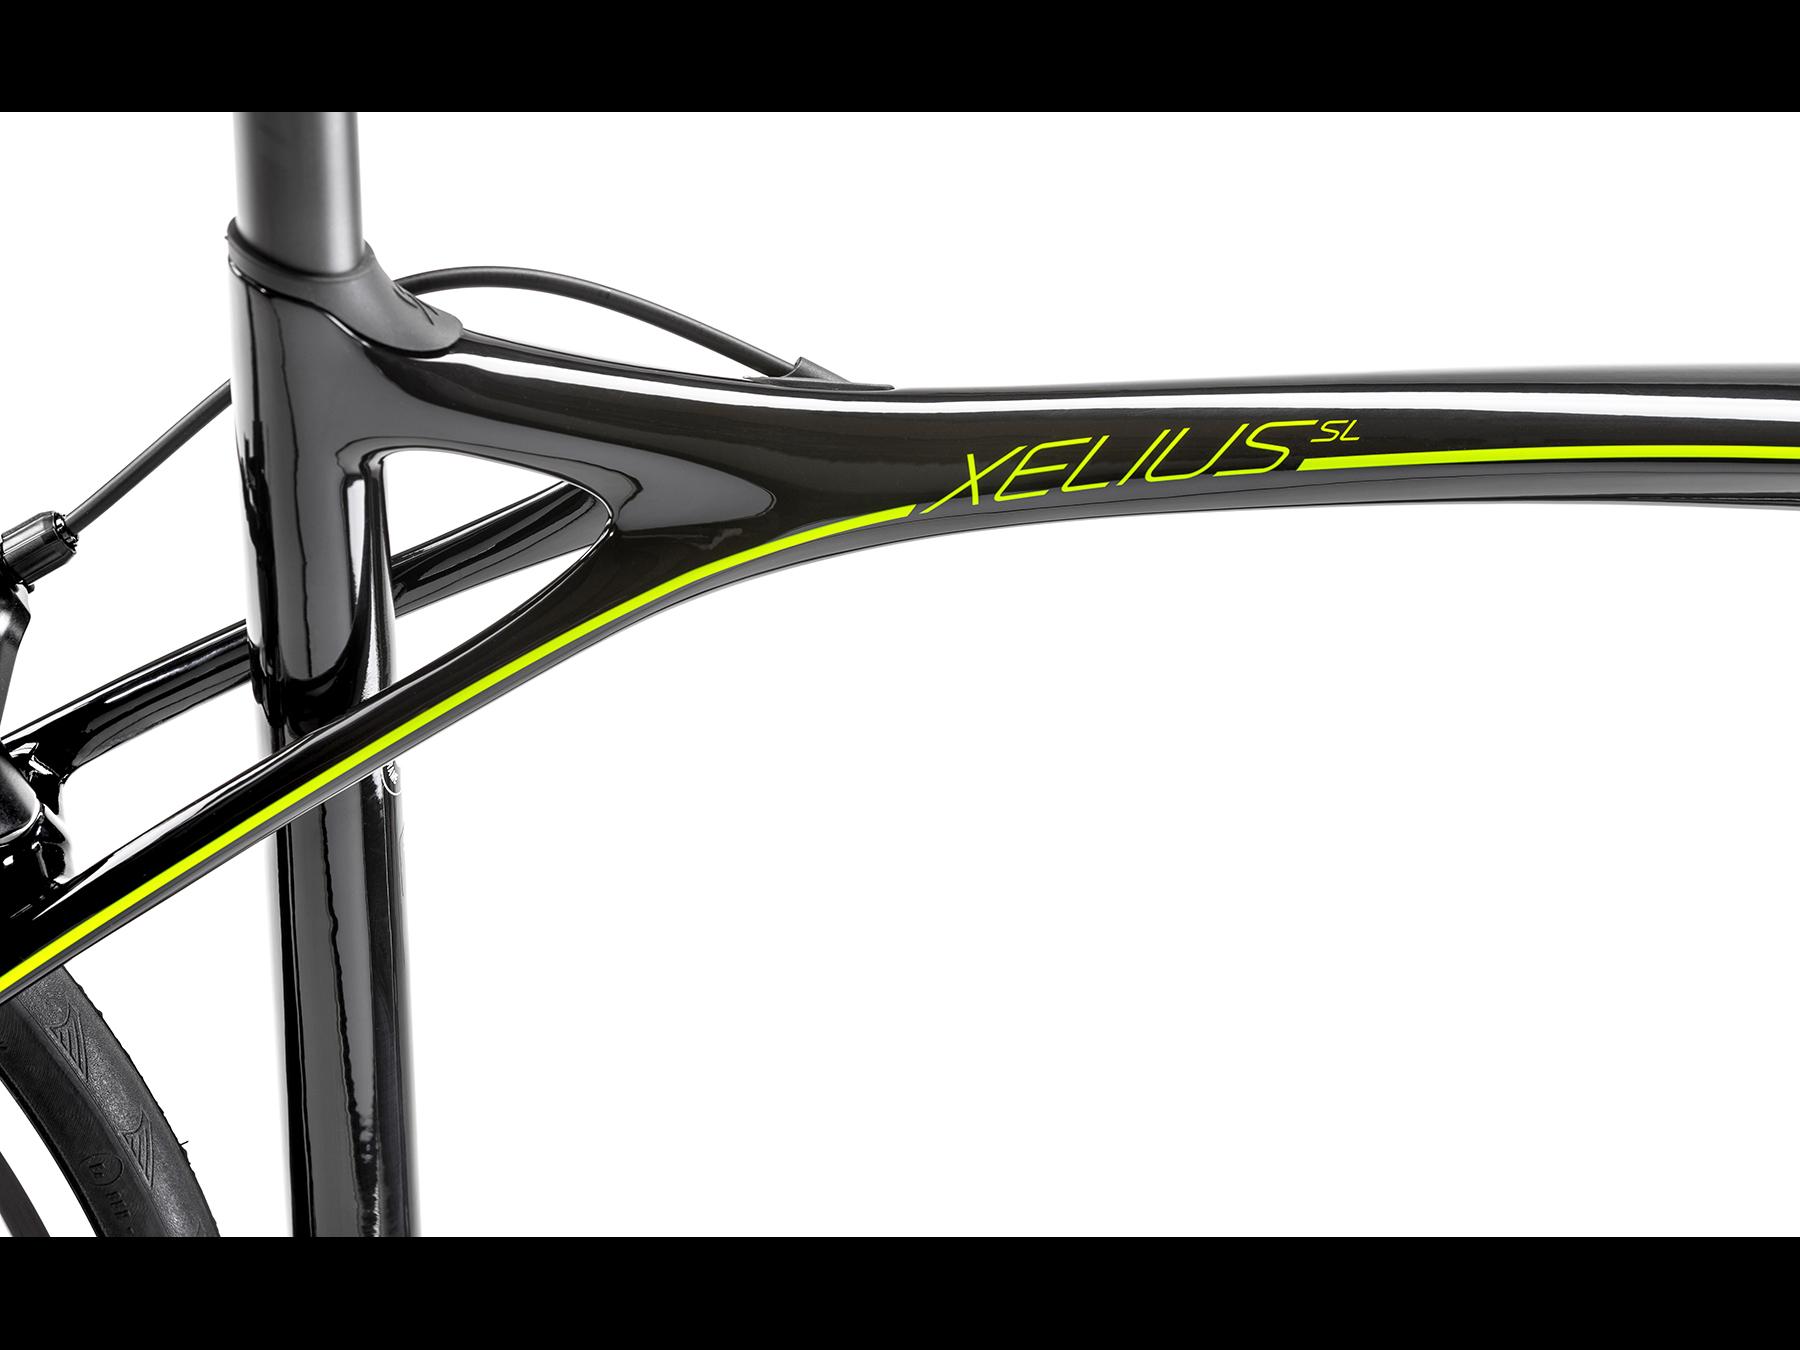 XELIUS SL 500 MC